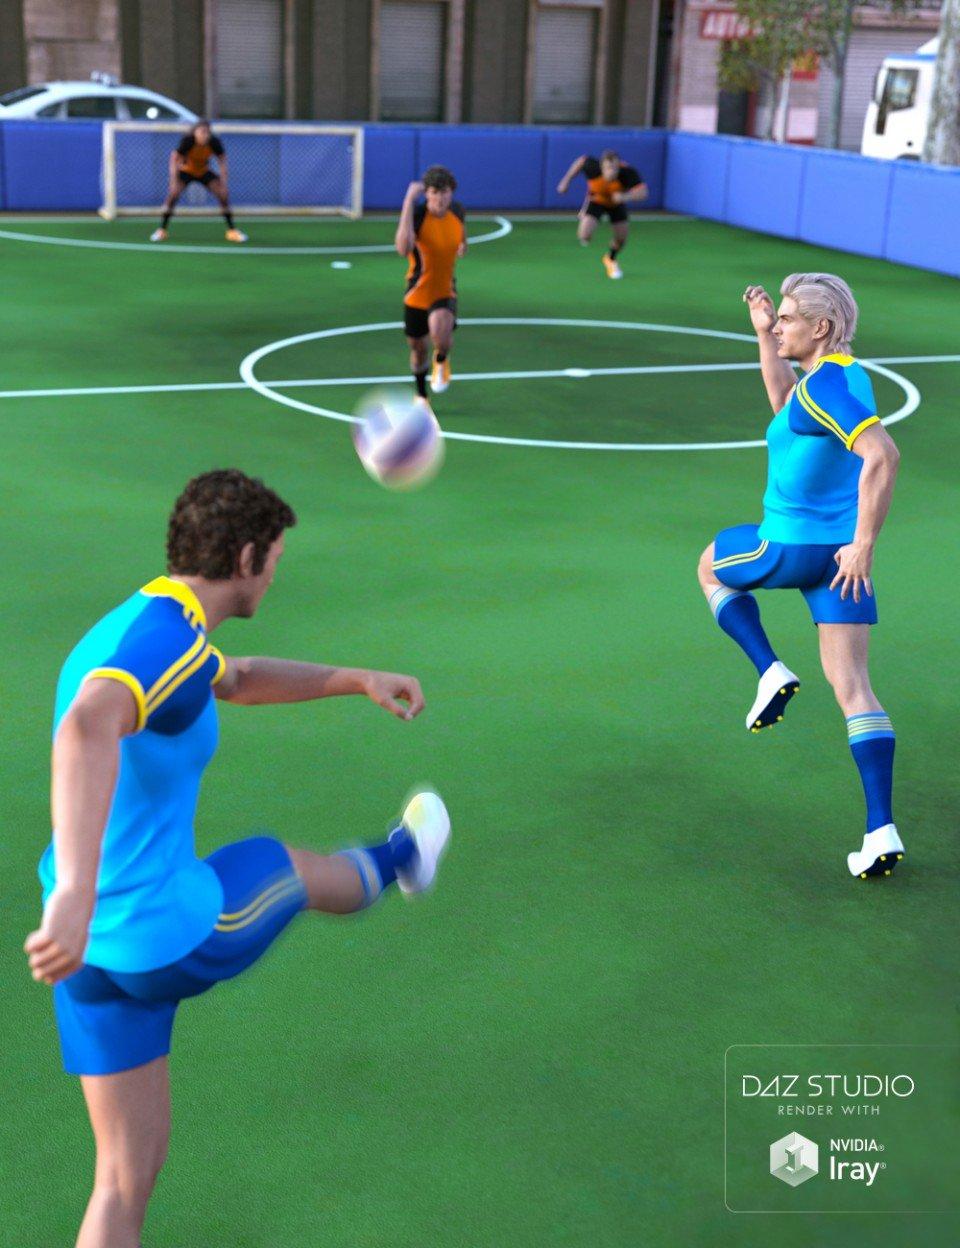 5 A-Side Football Pitch_DAZ3D下载站